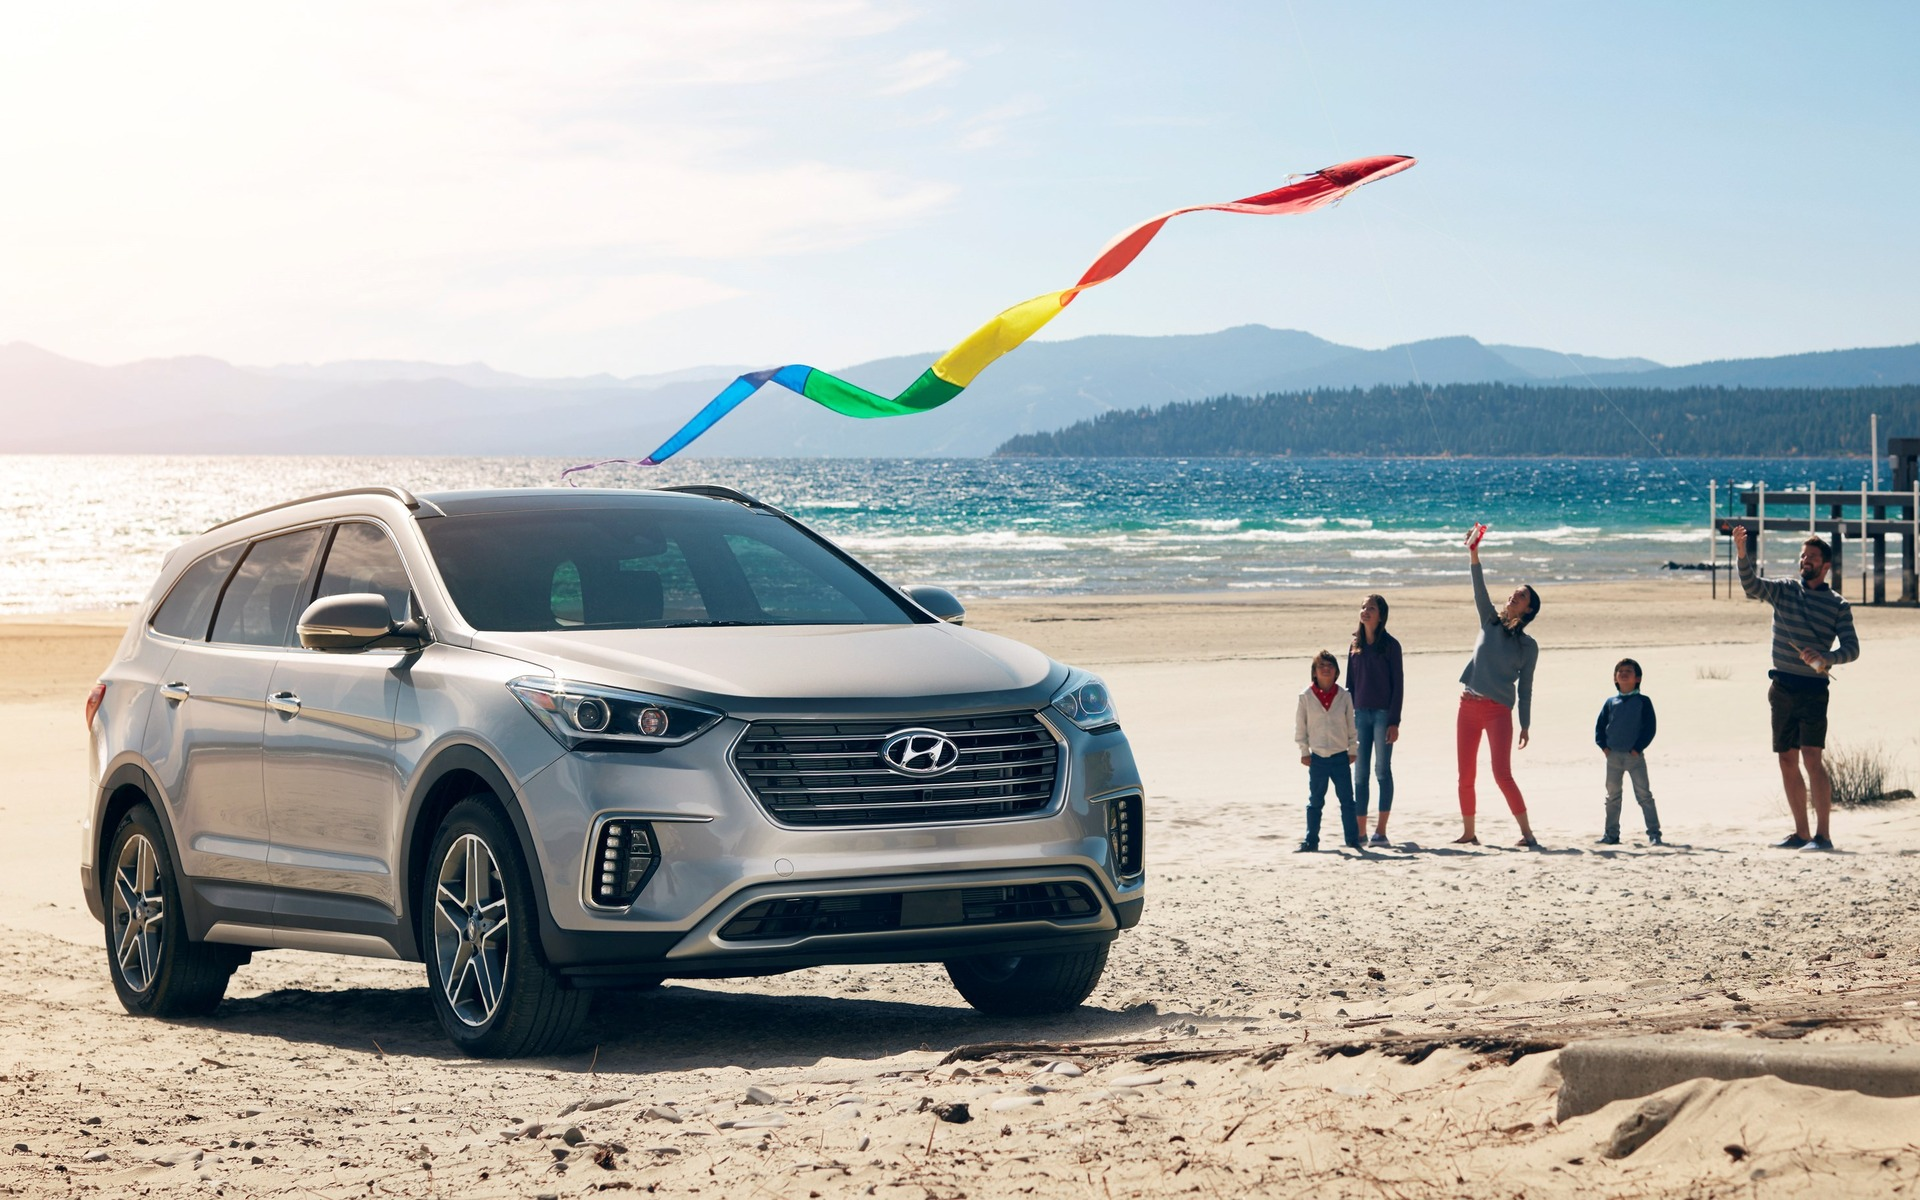 2018 Hyundai Santafe >> 2019 Hyundai Santa Fe to be Revealed in February - 4/5